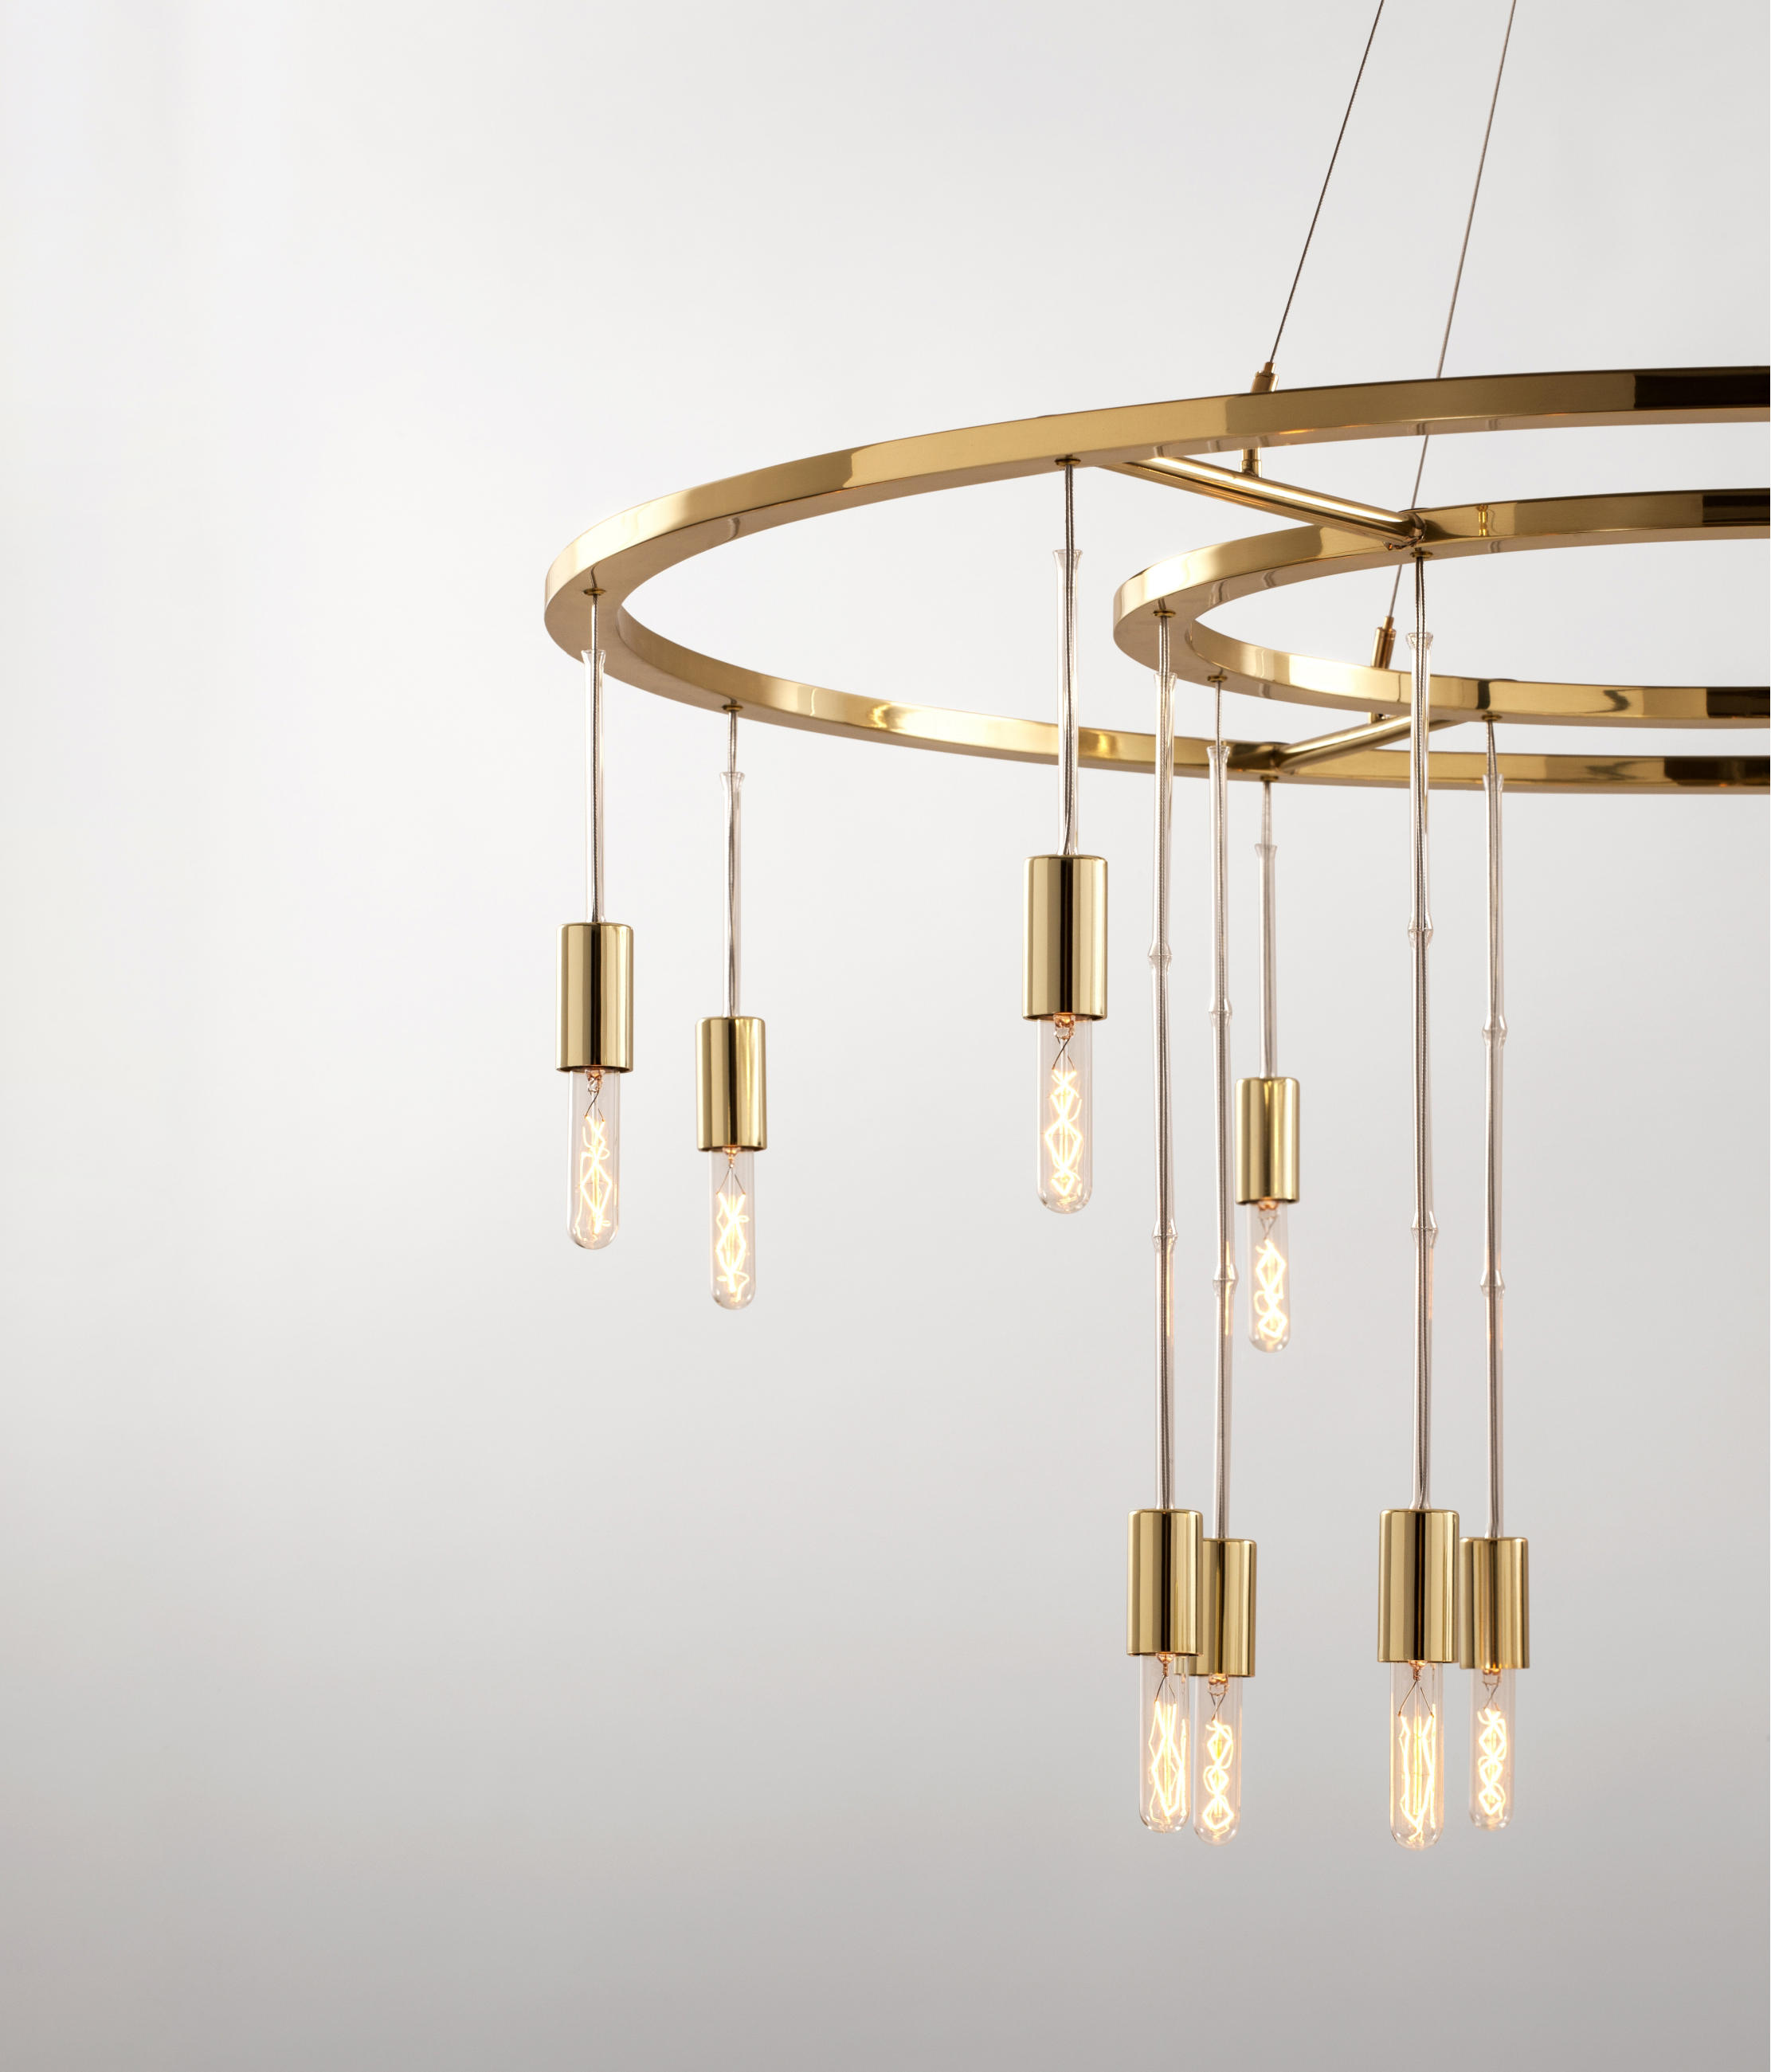 ... Vaghe Stelle | Pendant Lamp By Santa U0026 Cole | Chandeliers